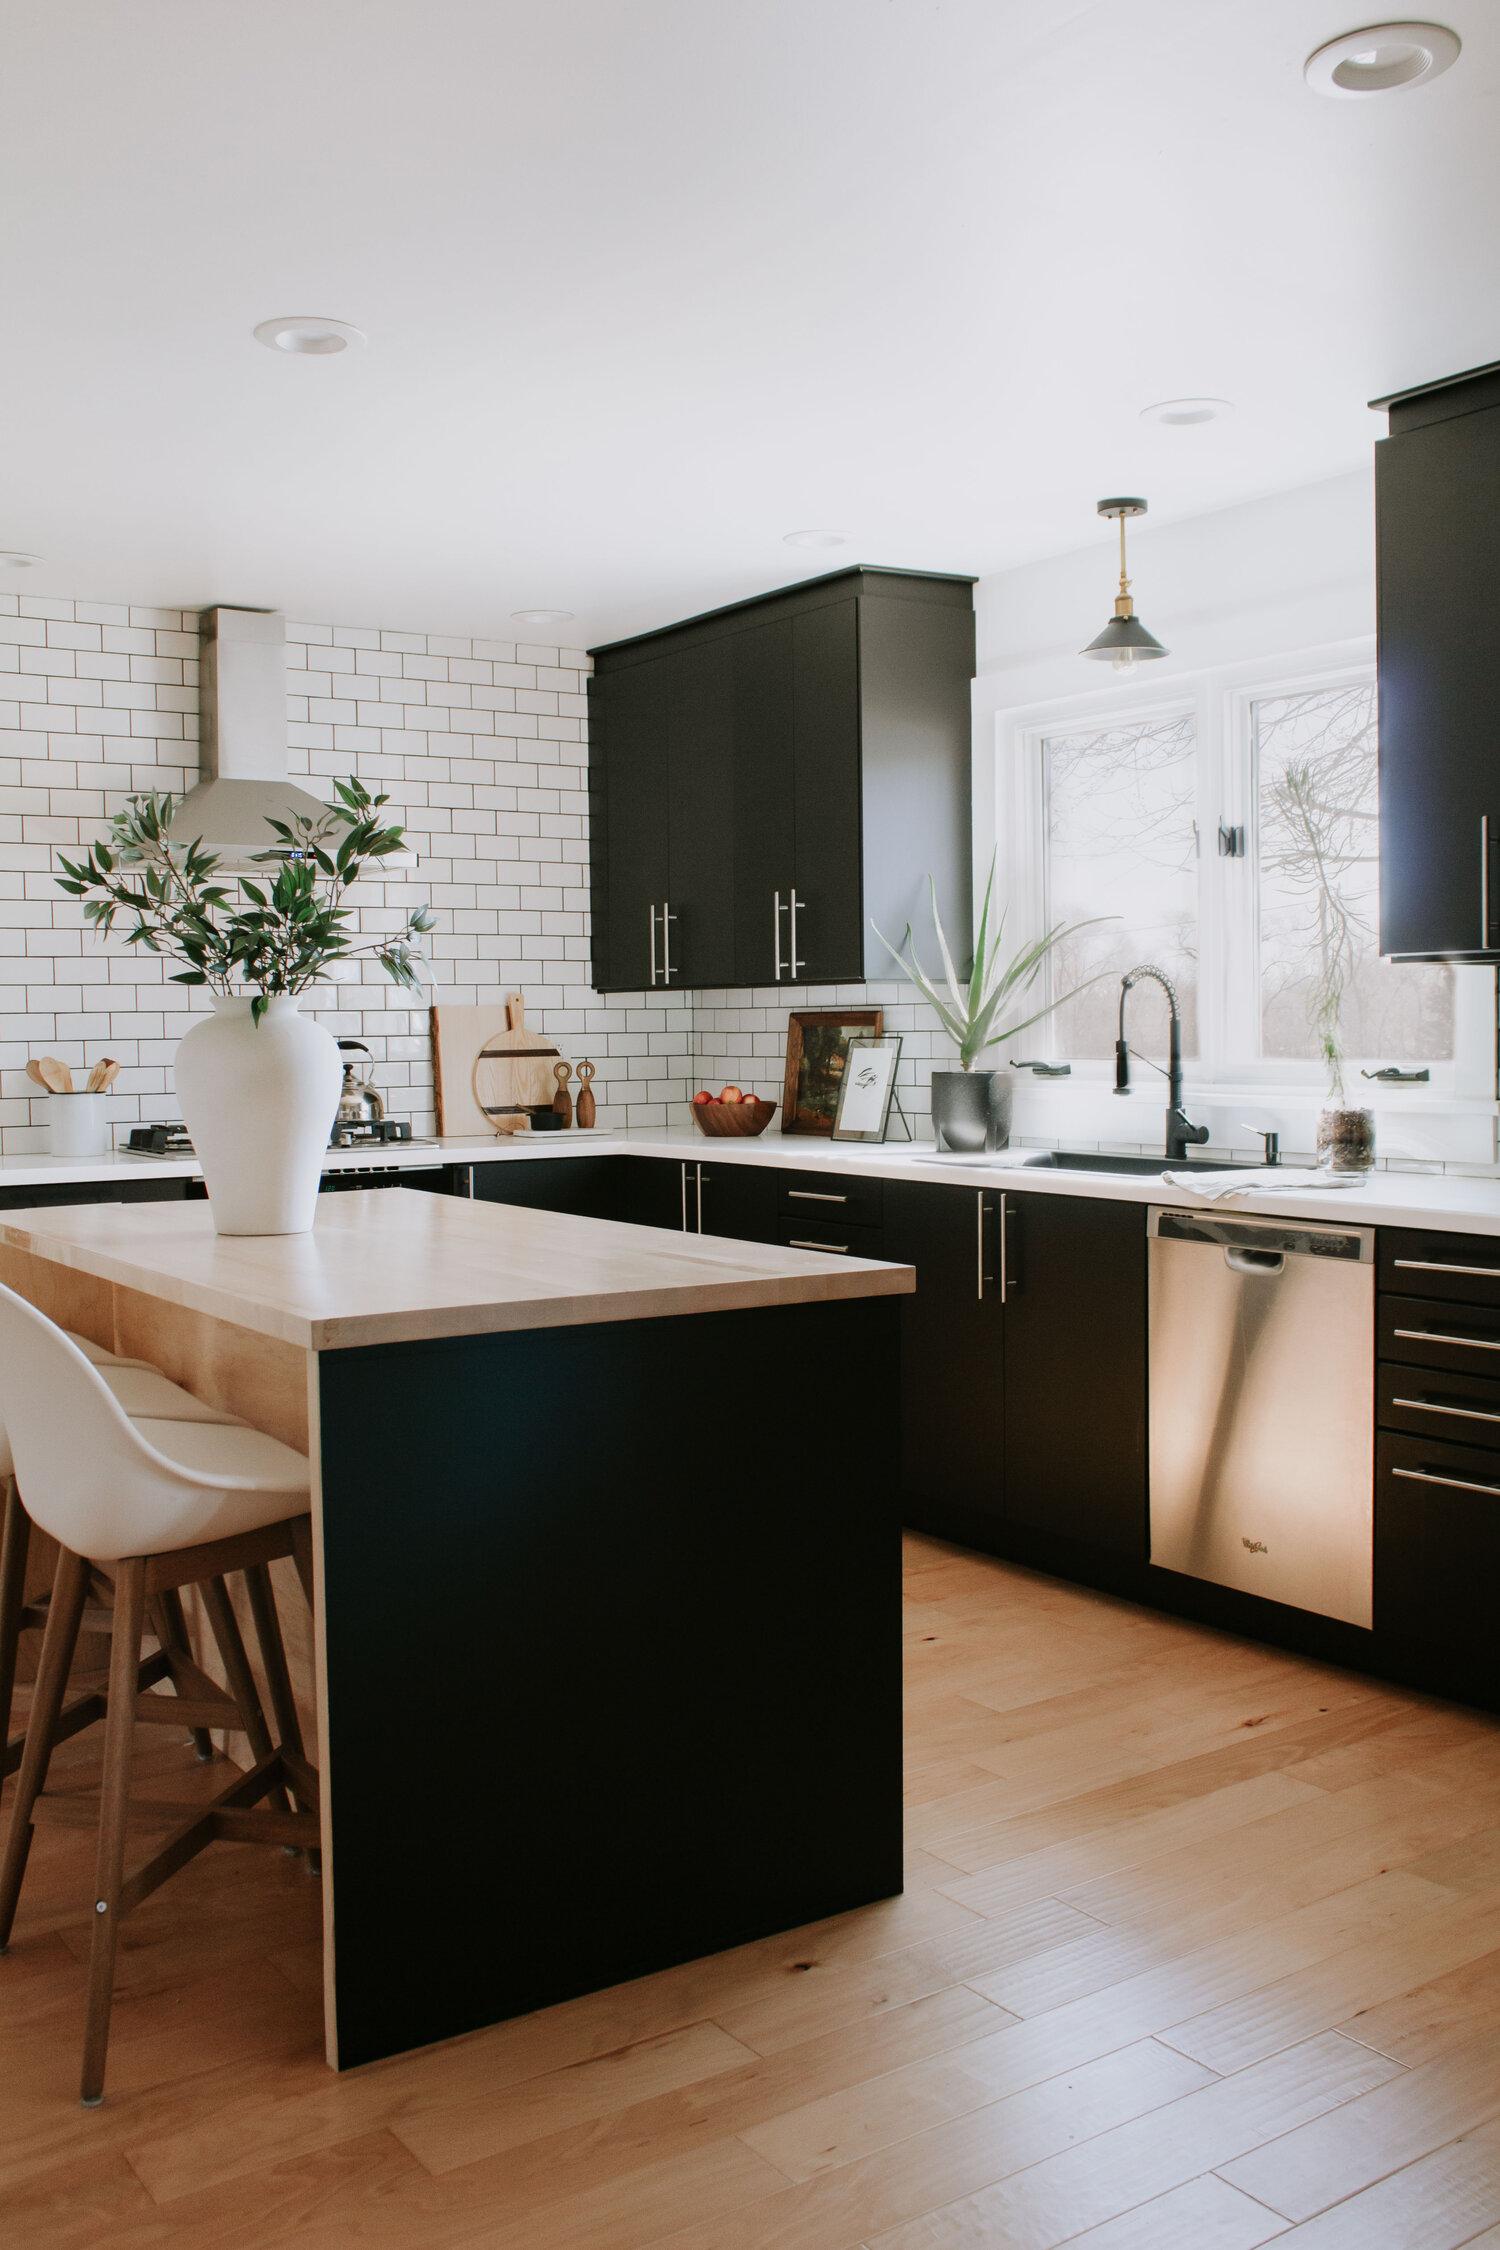 Ikea Kitchen Cabinets Q A Part 2 Nadine Stay